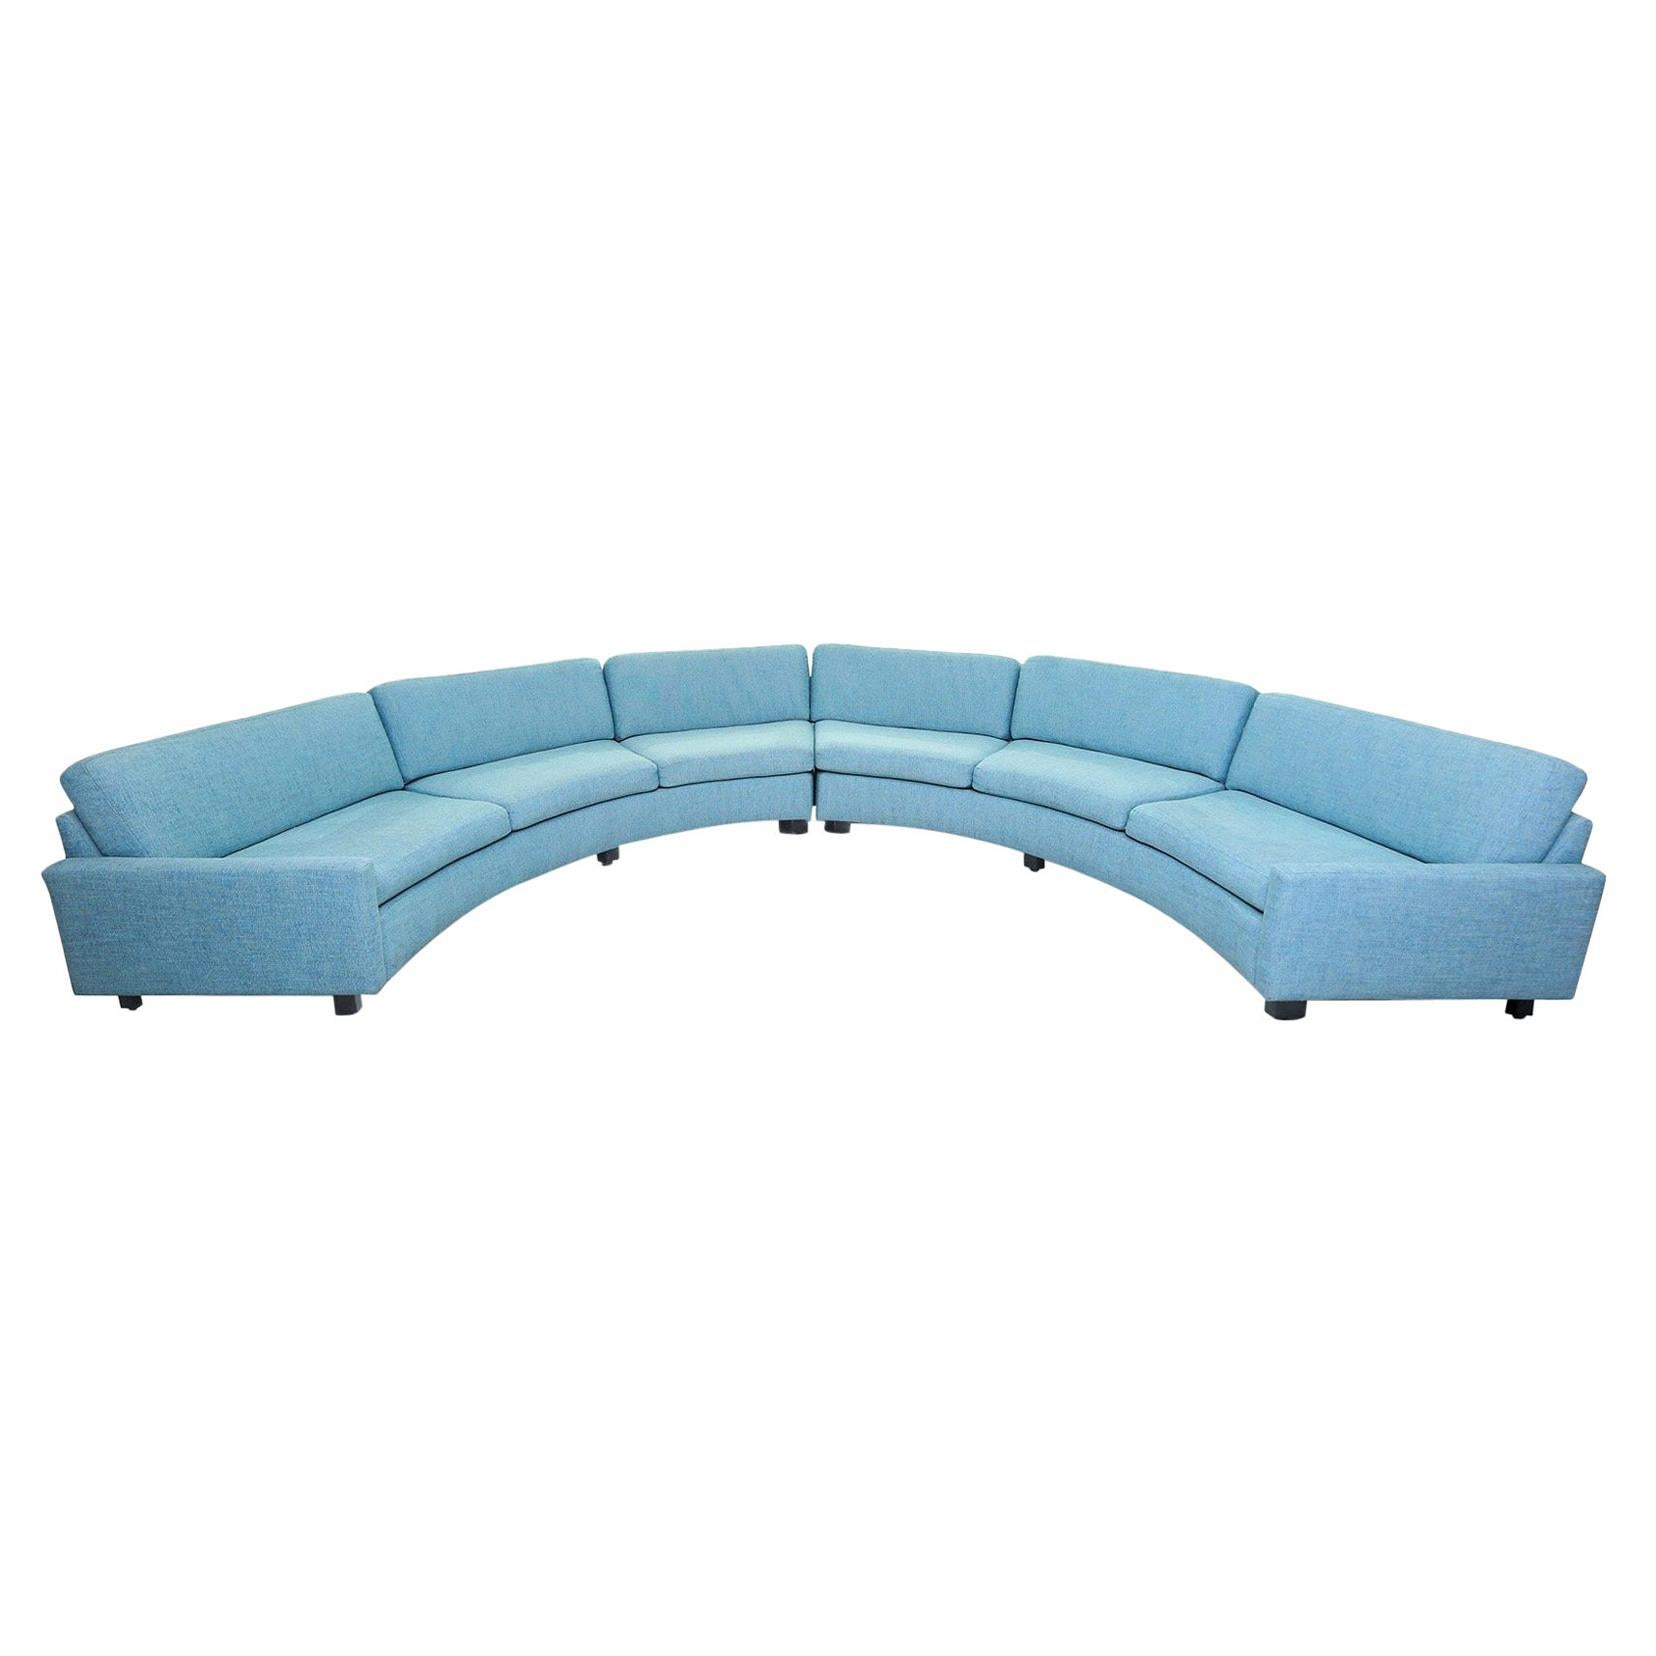 Milo Baughman Turquoise Aqua Semi Circular Sectional Sofa for Thayer Coggin